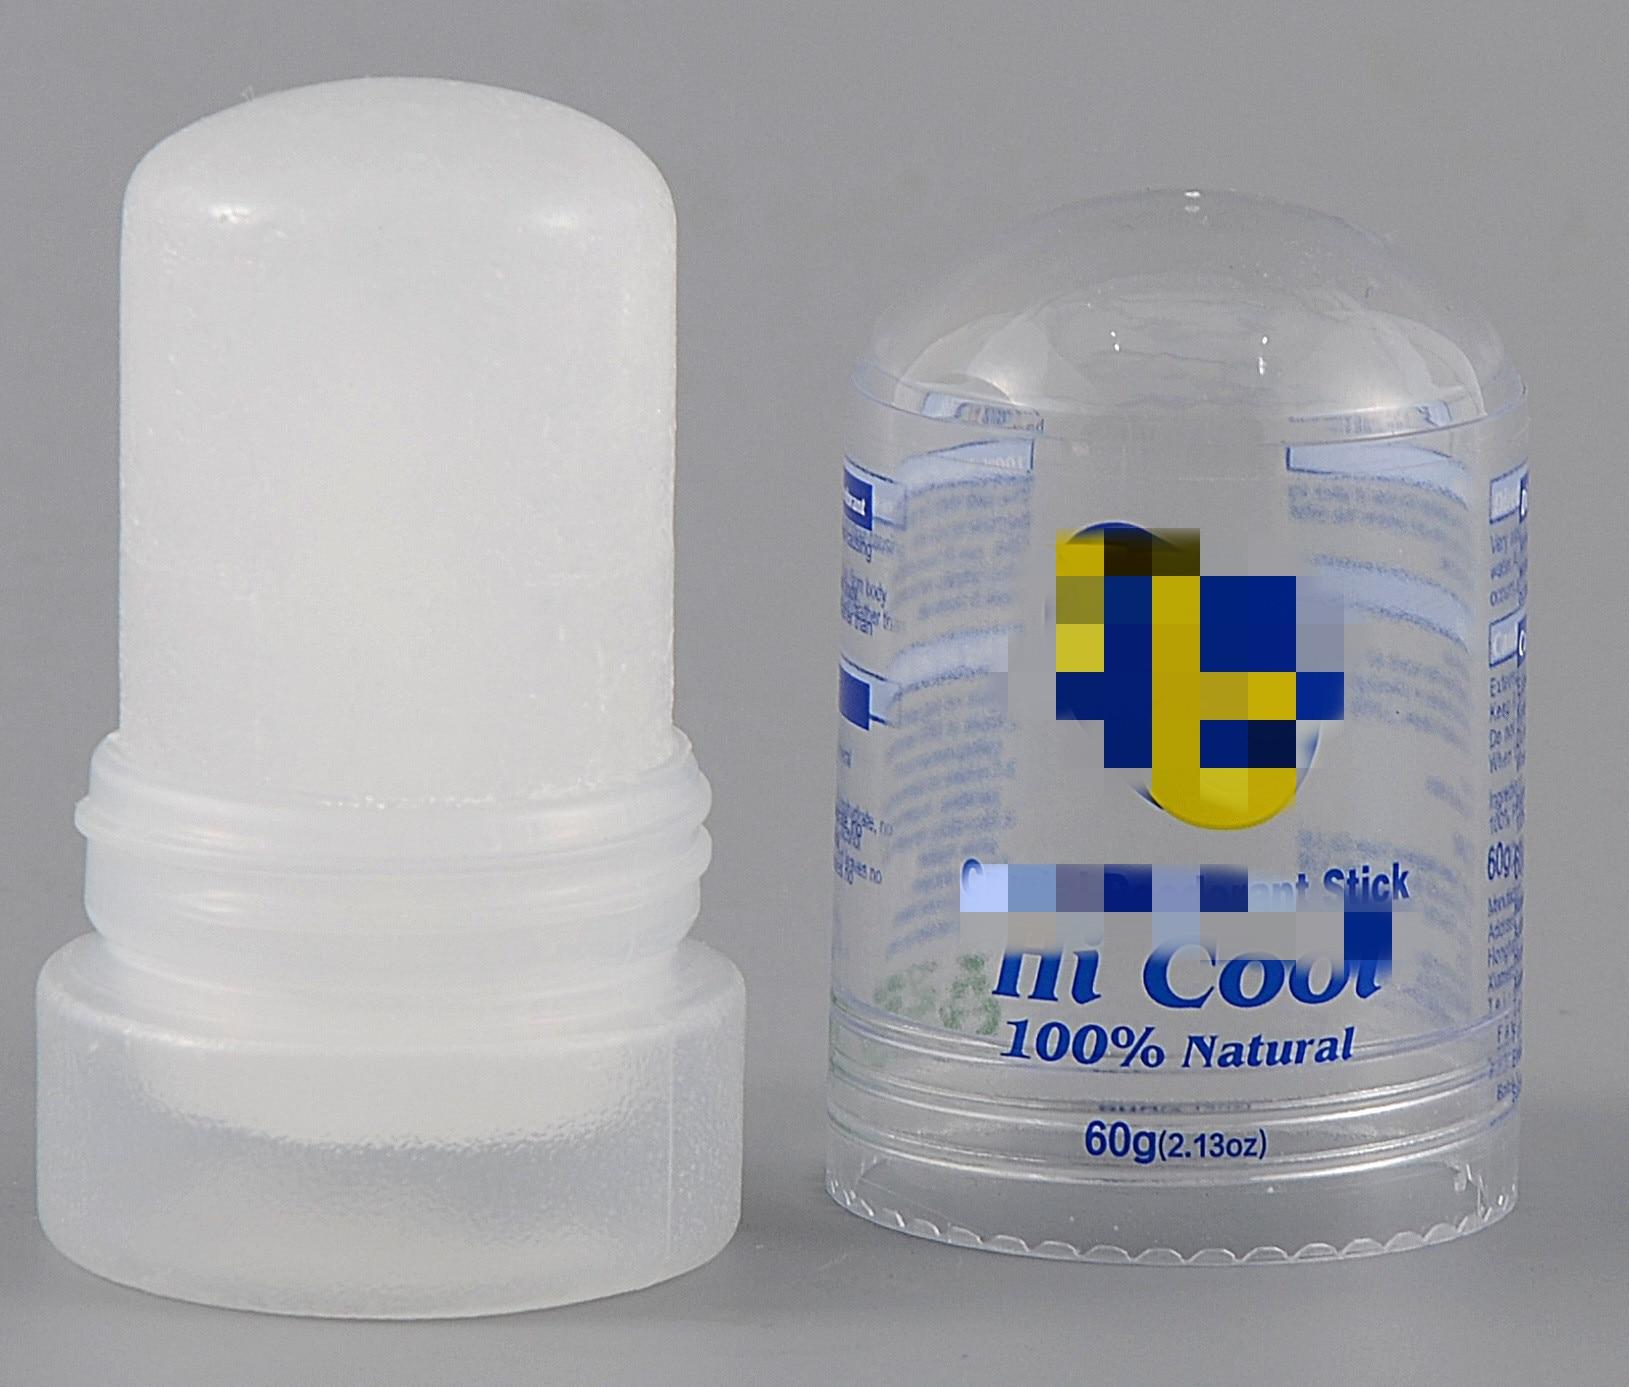 60g Alum Stick Deodorant Stick Antiperspirant Stick Alum Crystal Deodorant Underarm Removal For Women Man